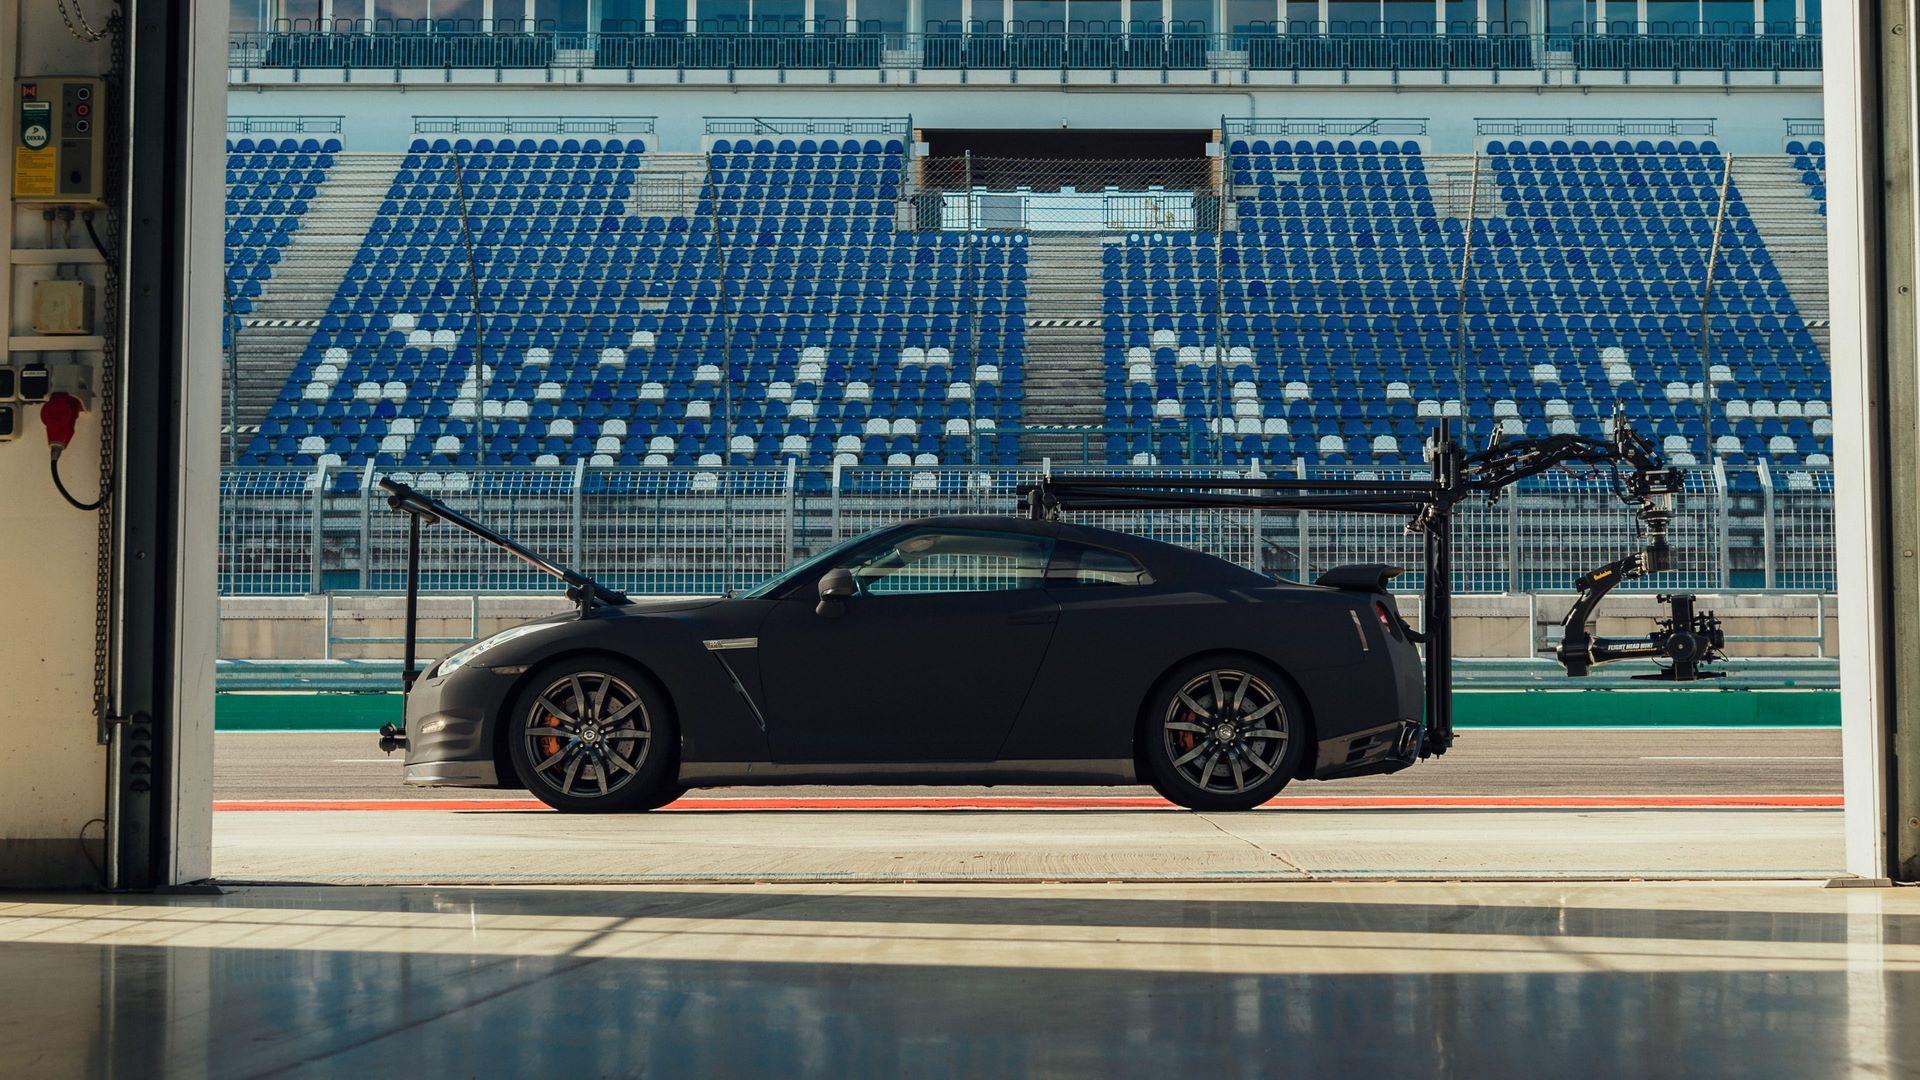 Nissan-GT-R-Camera-Car-4